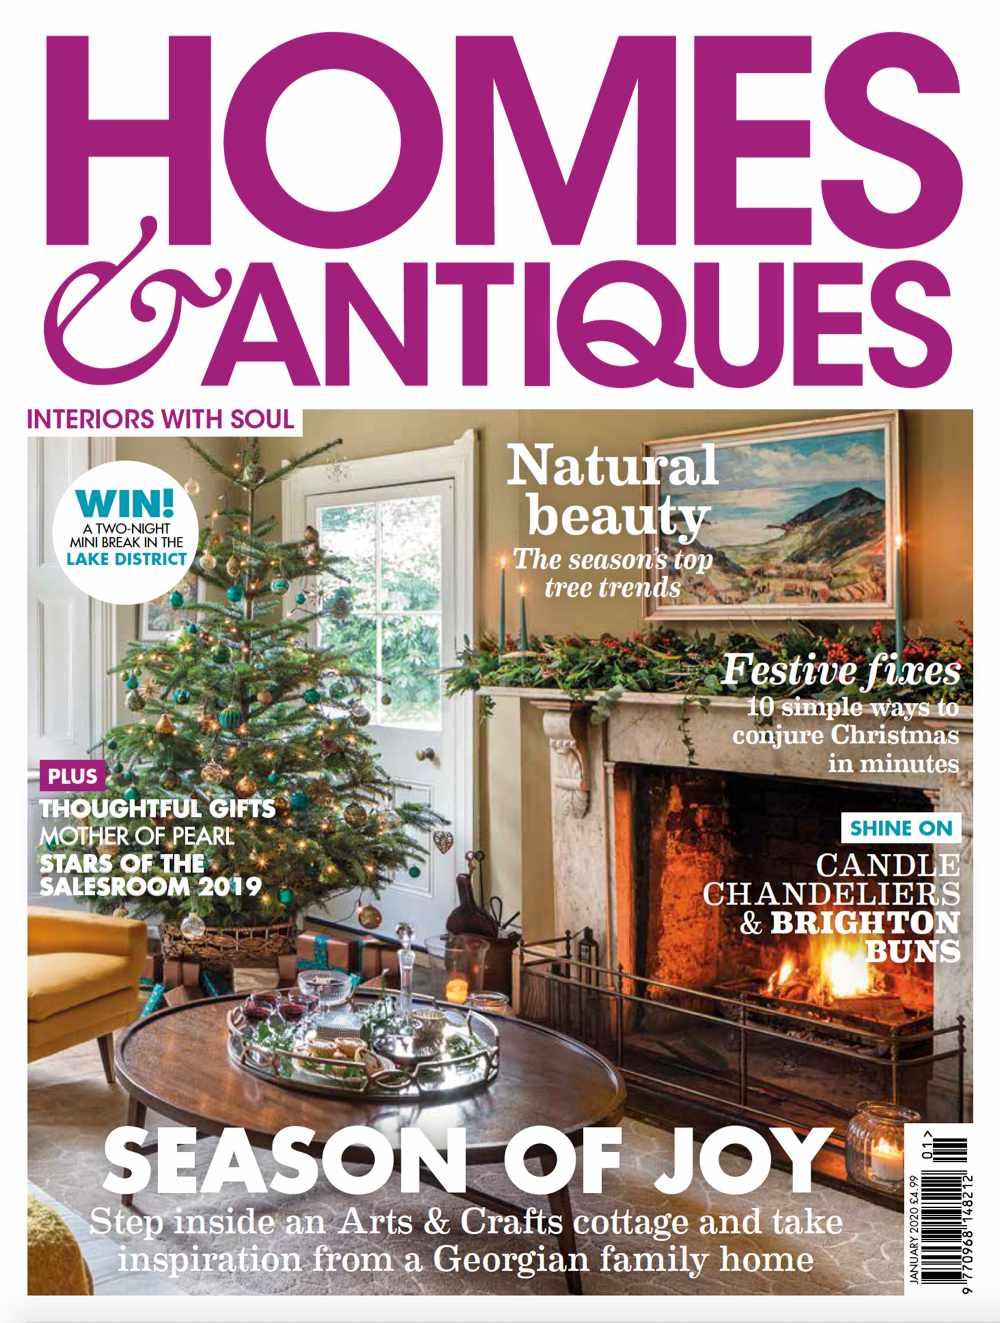 Homes & Antiques magazine January 2020